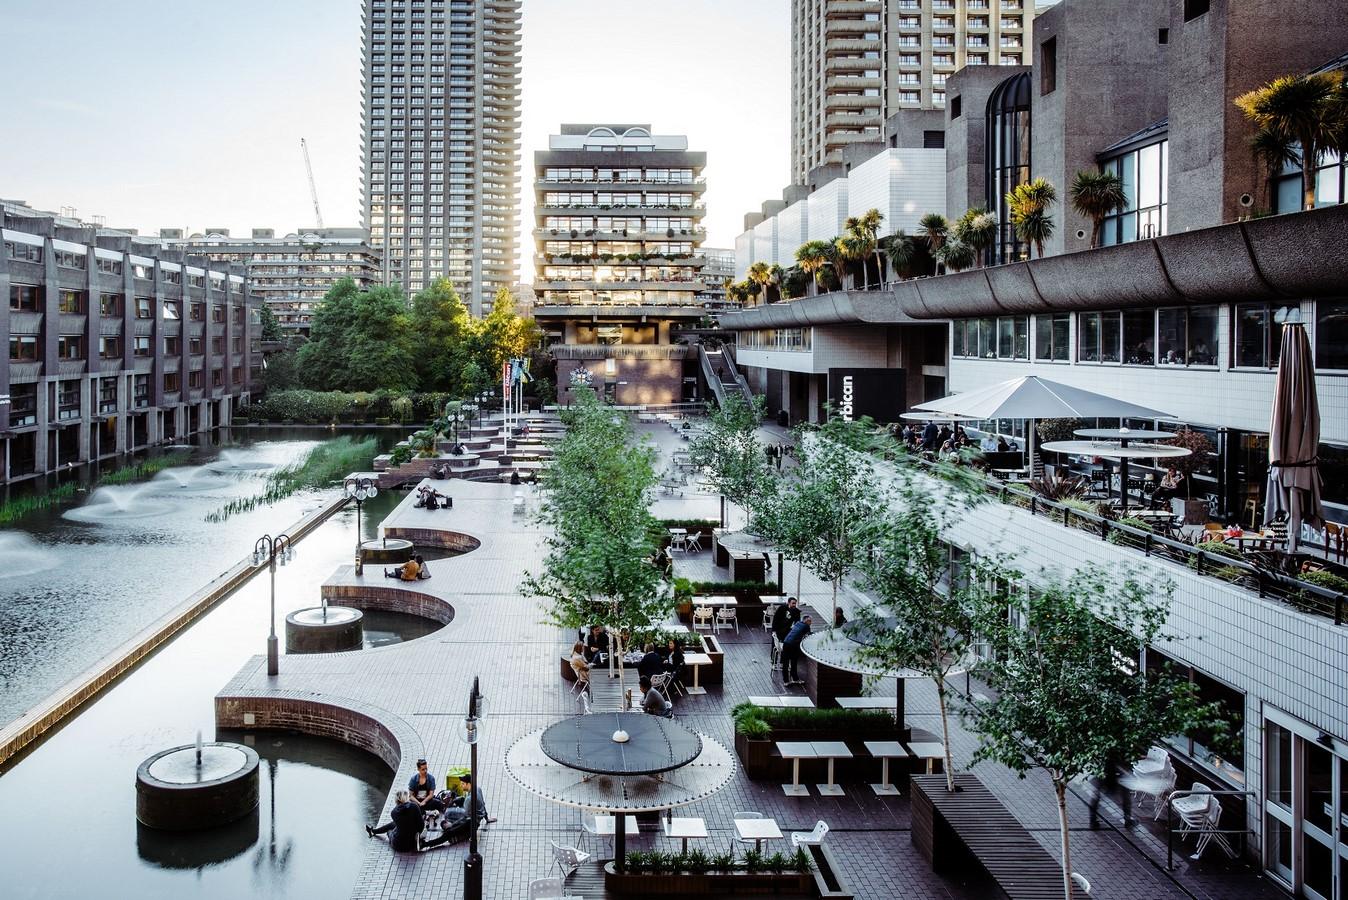 Youtube for Architects: 'Smart Cities / Smart Buildings' seminar- Zaha Hadid Architects Sheet5